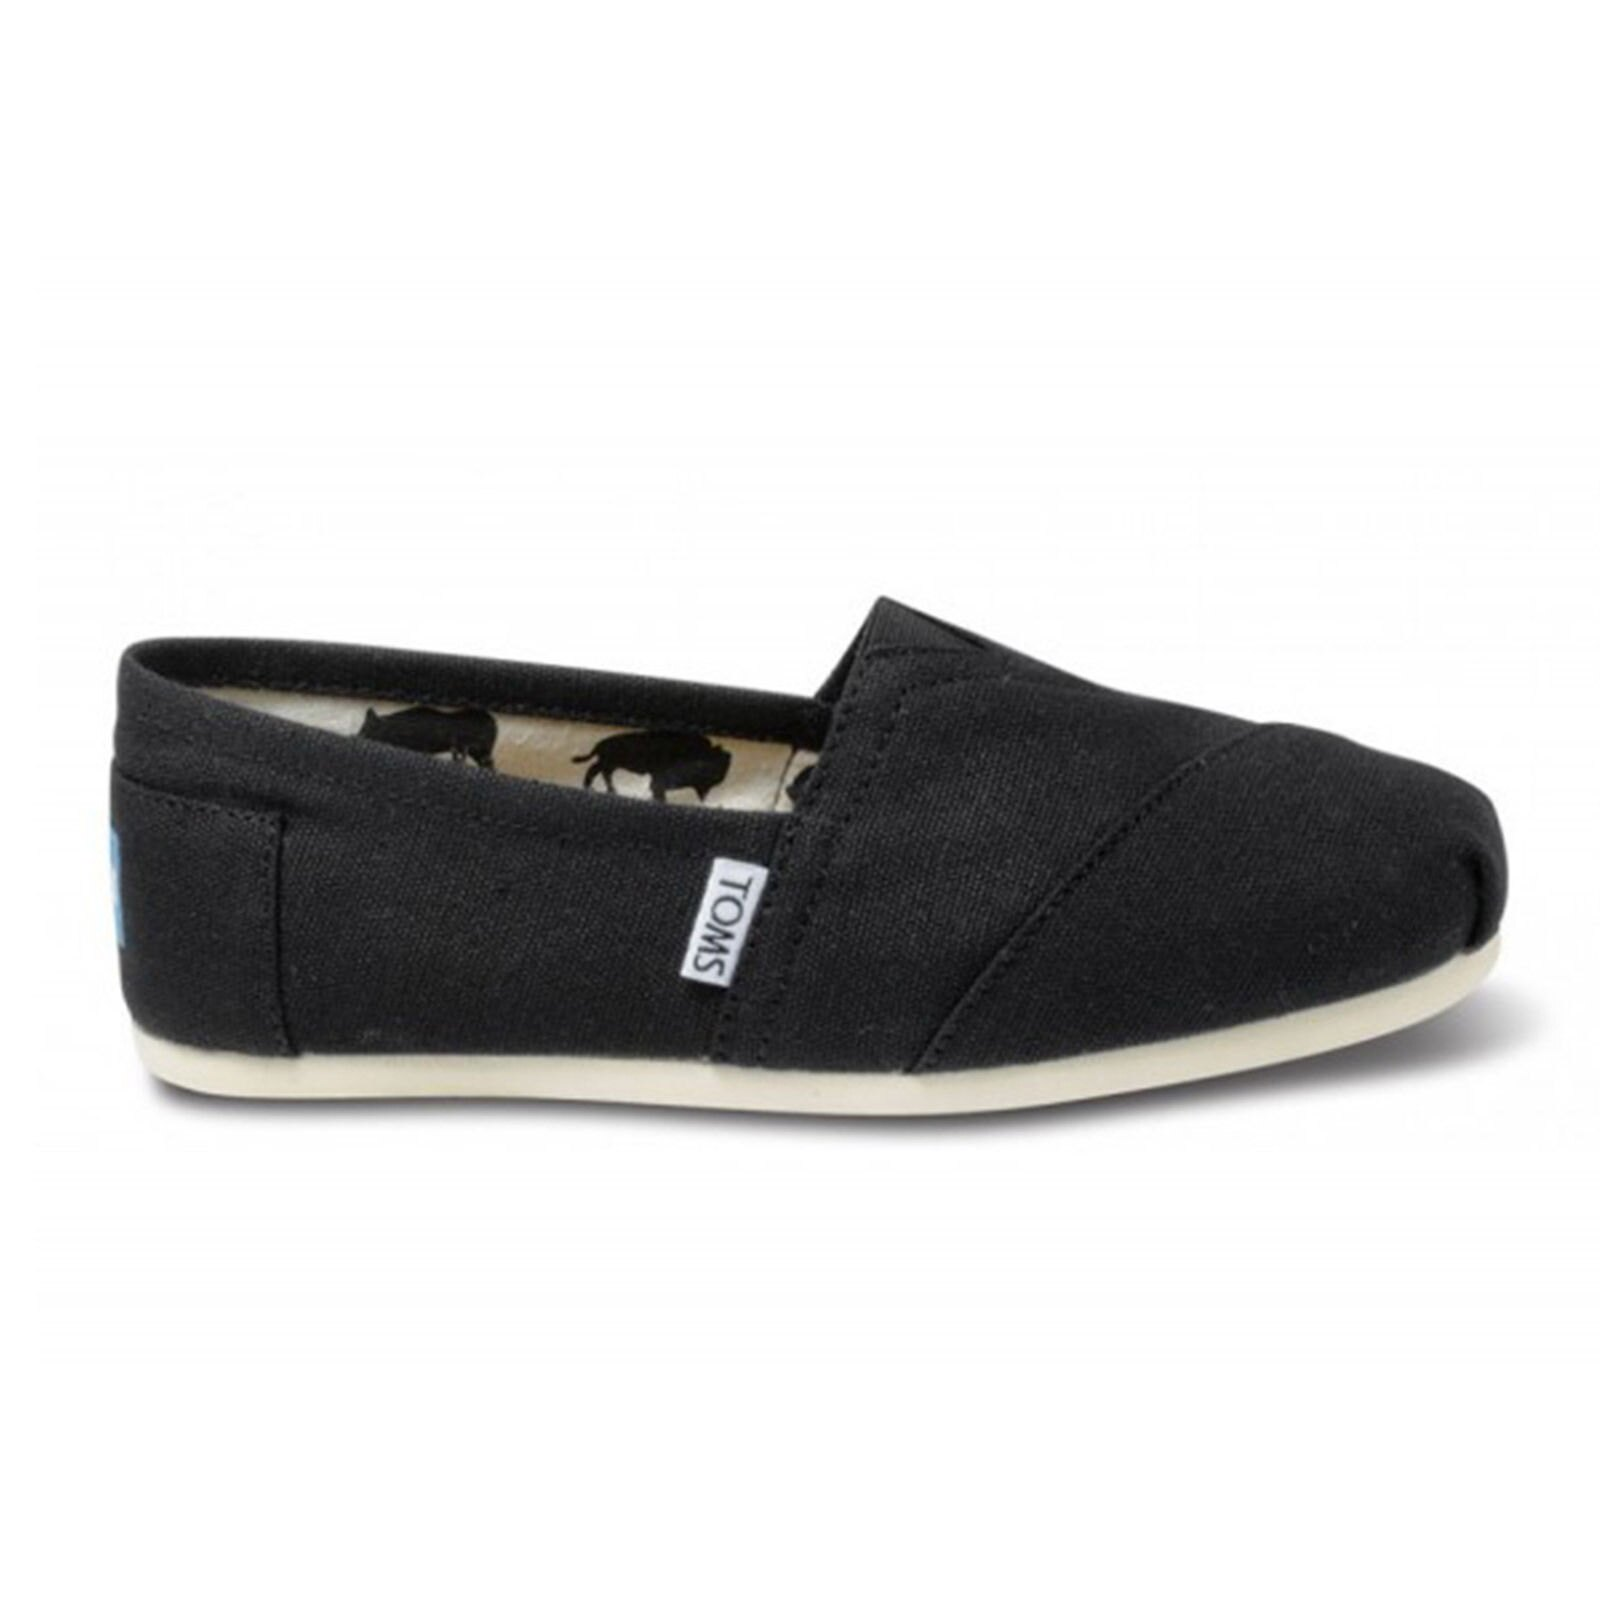 【TOMS】黑色素面基本款休閒鞋  Black Canvas Women's Classics 2